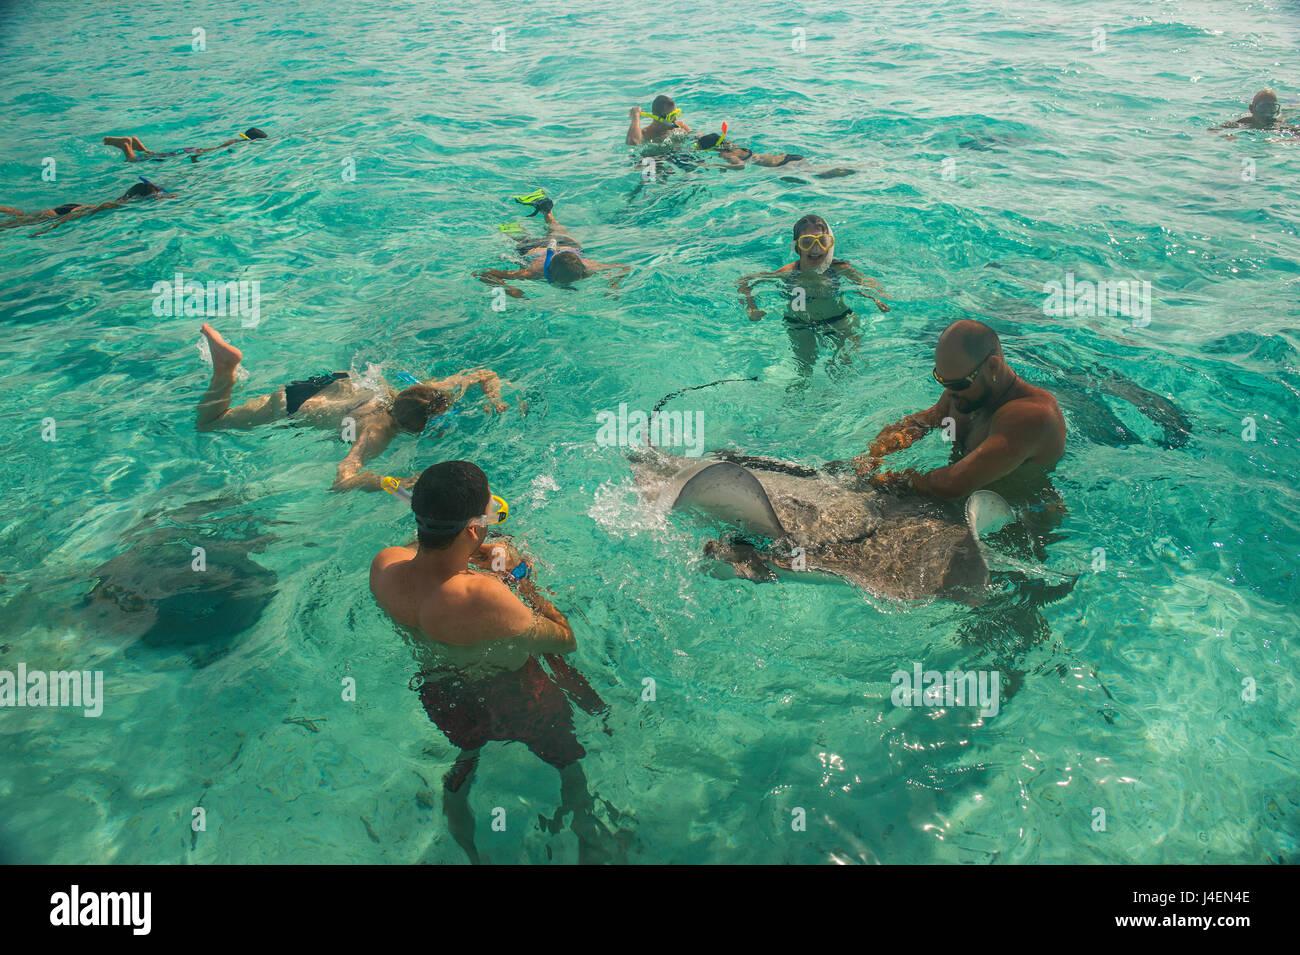 Tourists swimming with sting rays, Bora Bora, Society Islands, French Polynesia, Pacific - Stock Image